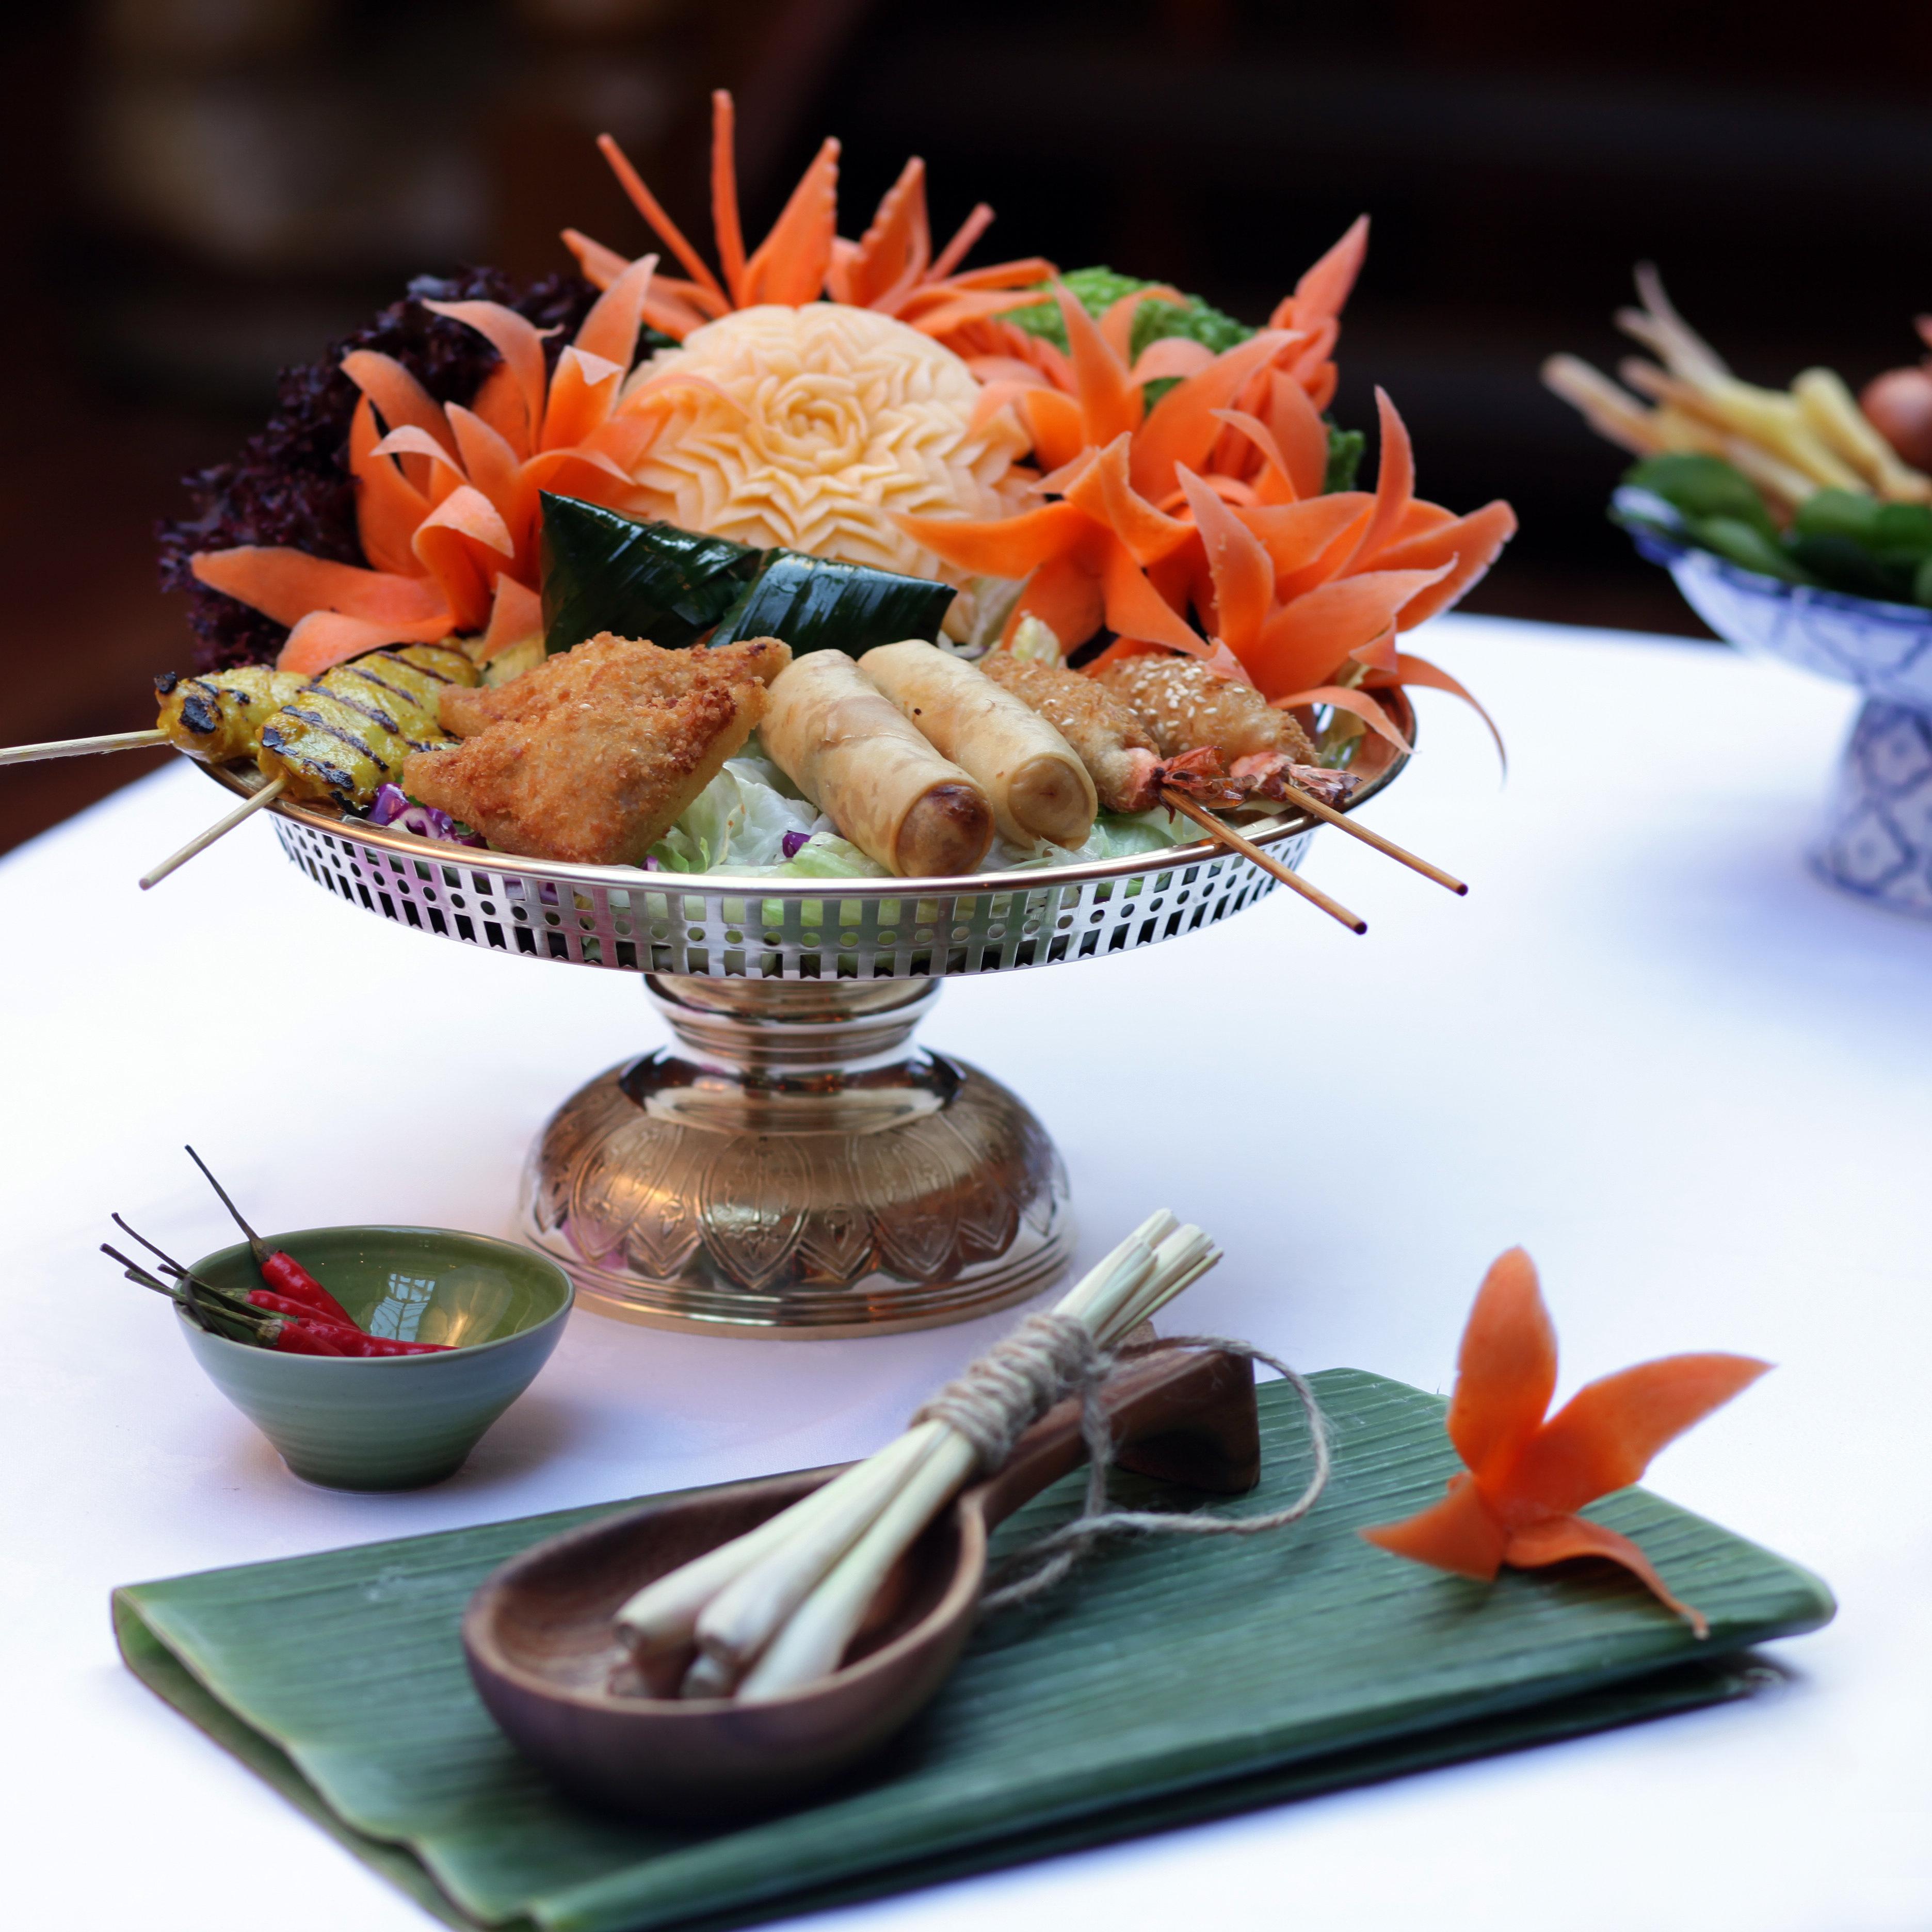 The Emerald Thai Restaurant